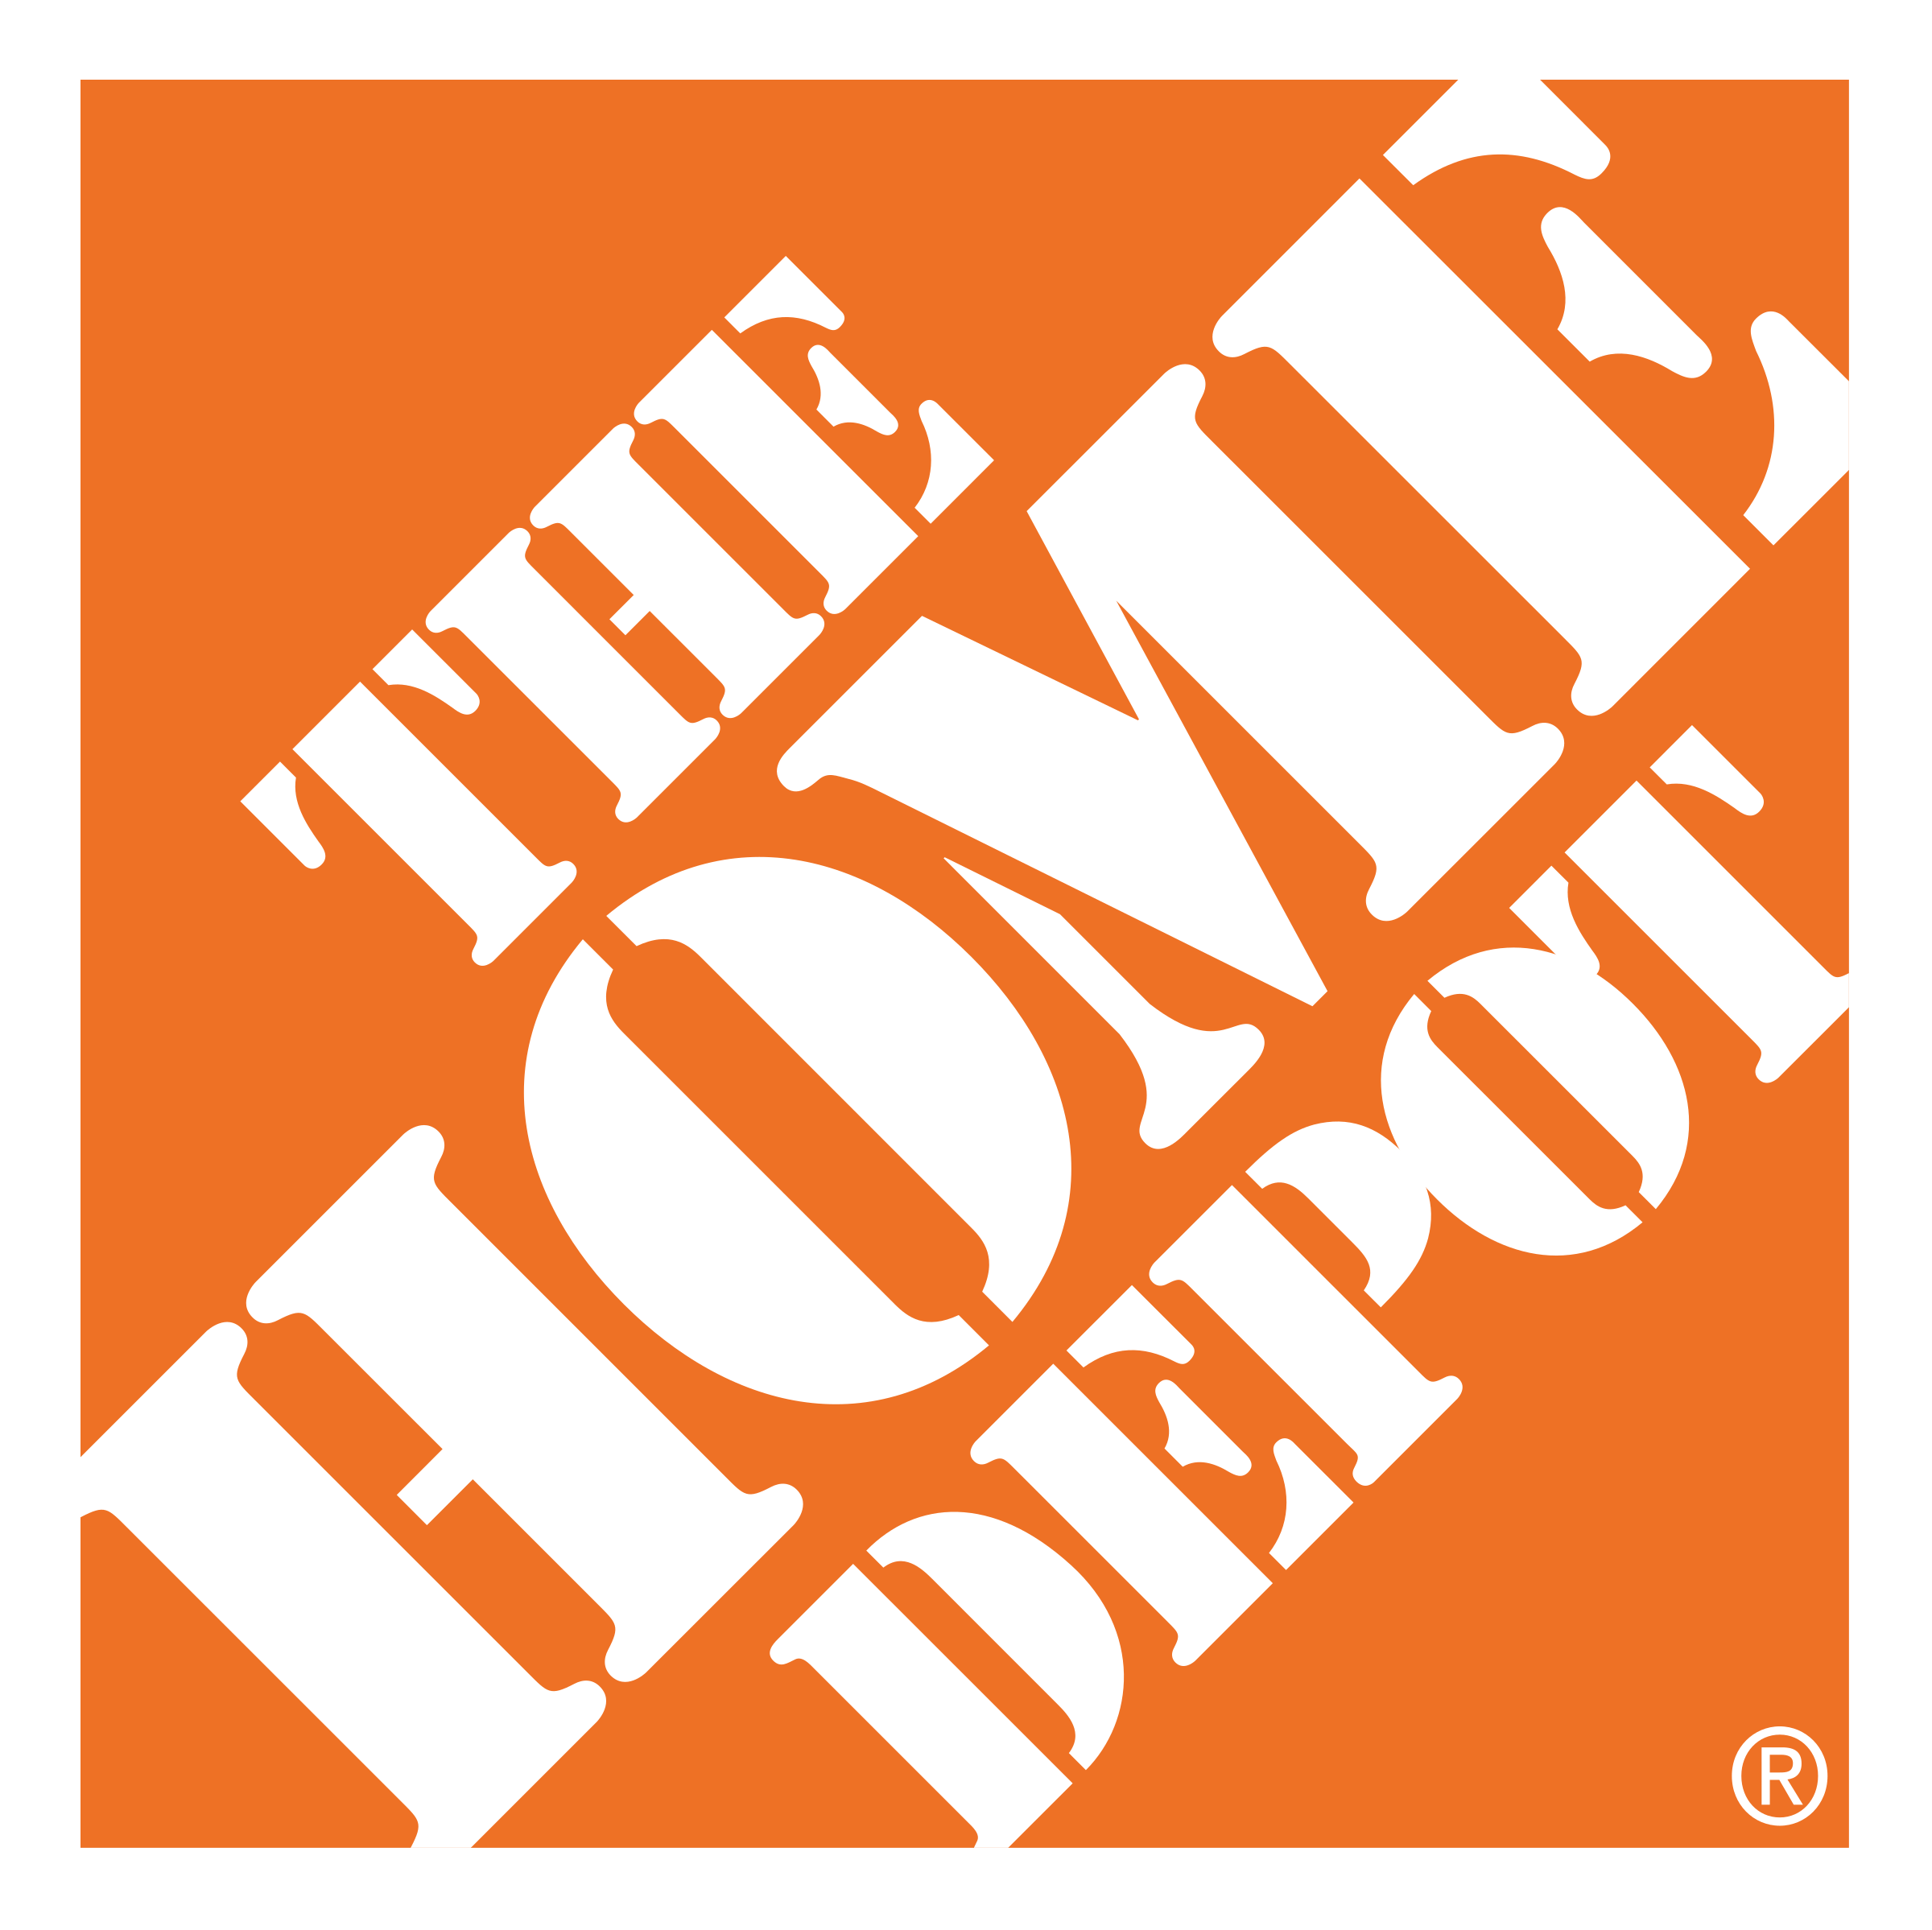 images home depot. Home Depot Logo Images E